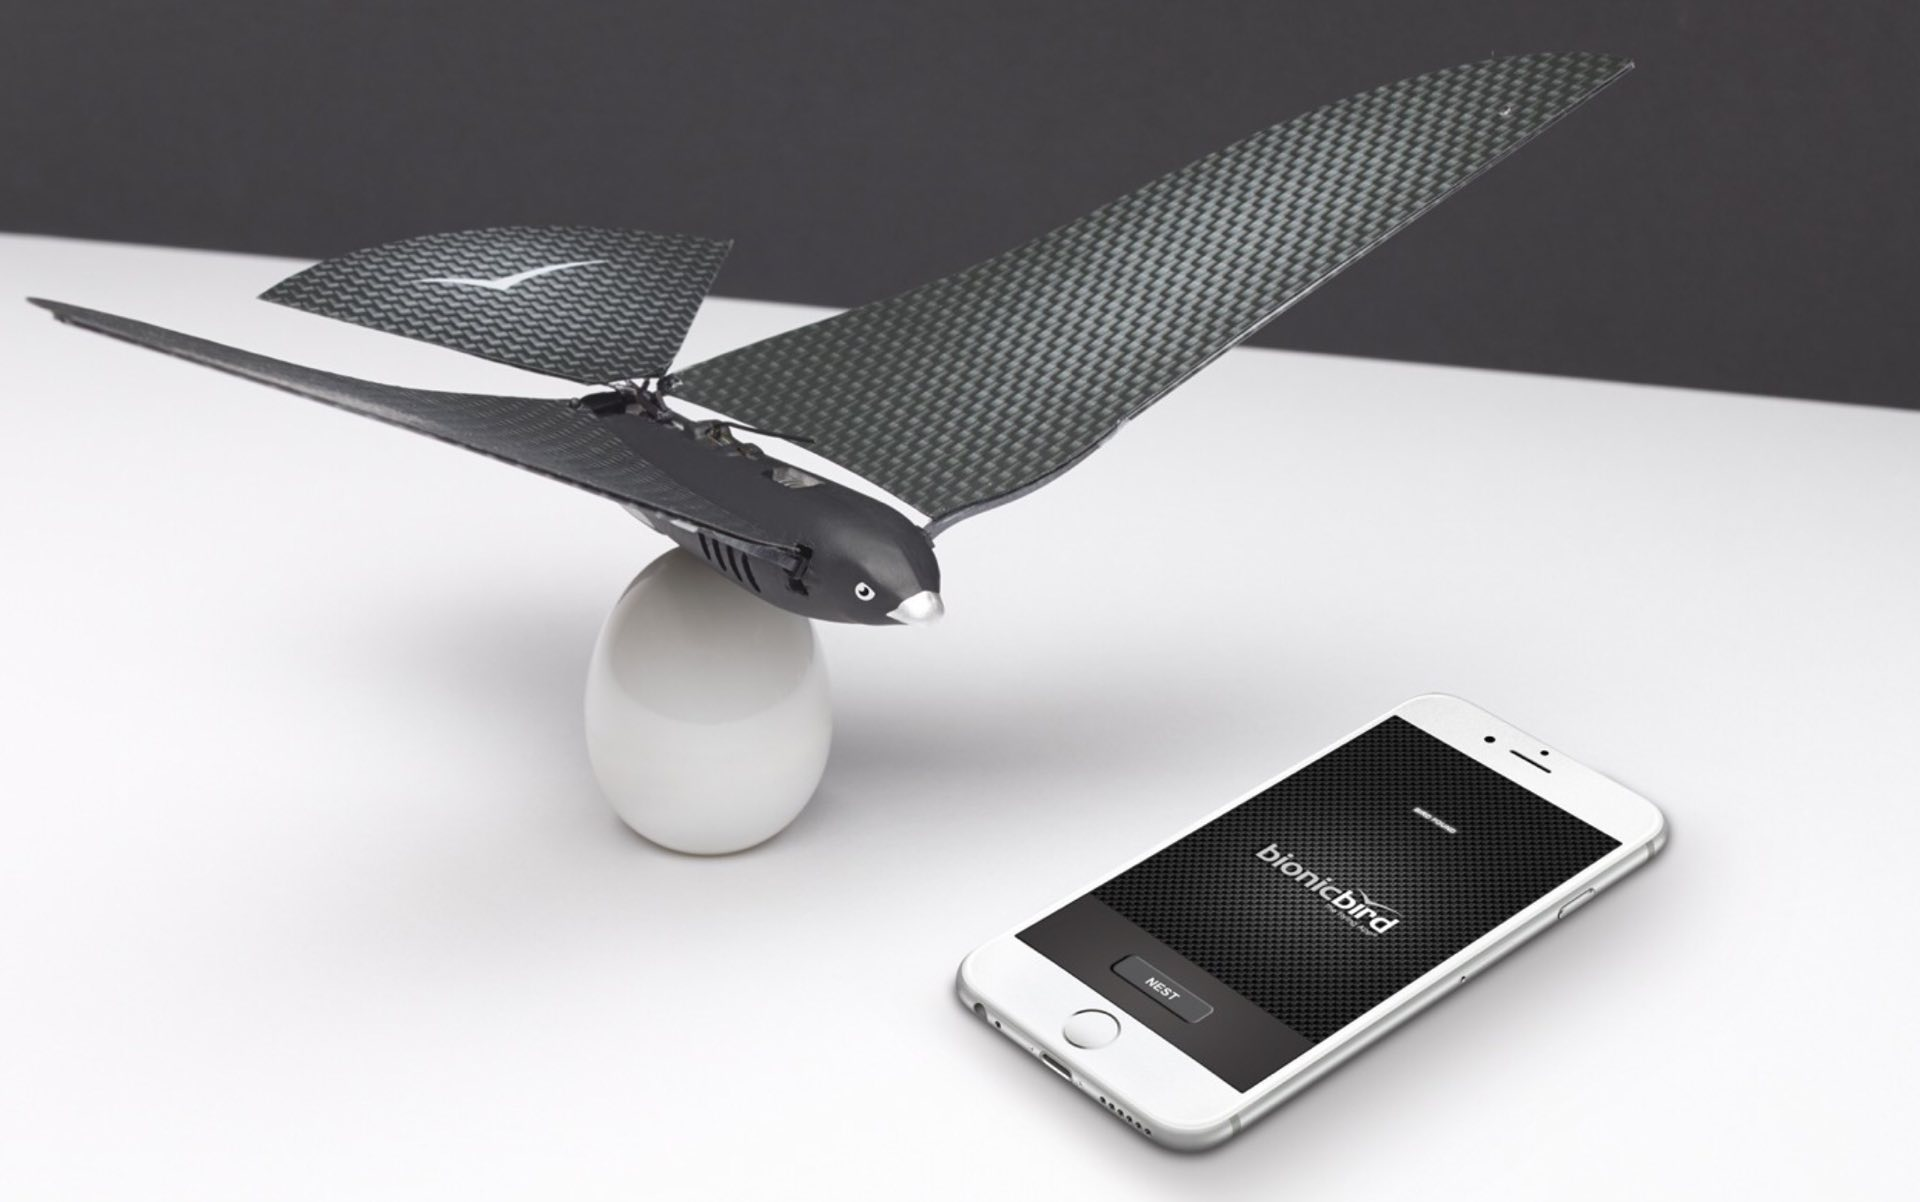 xtim-bb1-bionic-bird-deluxe-drone